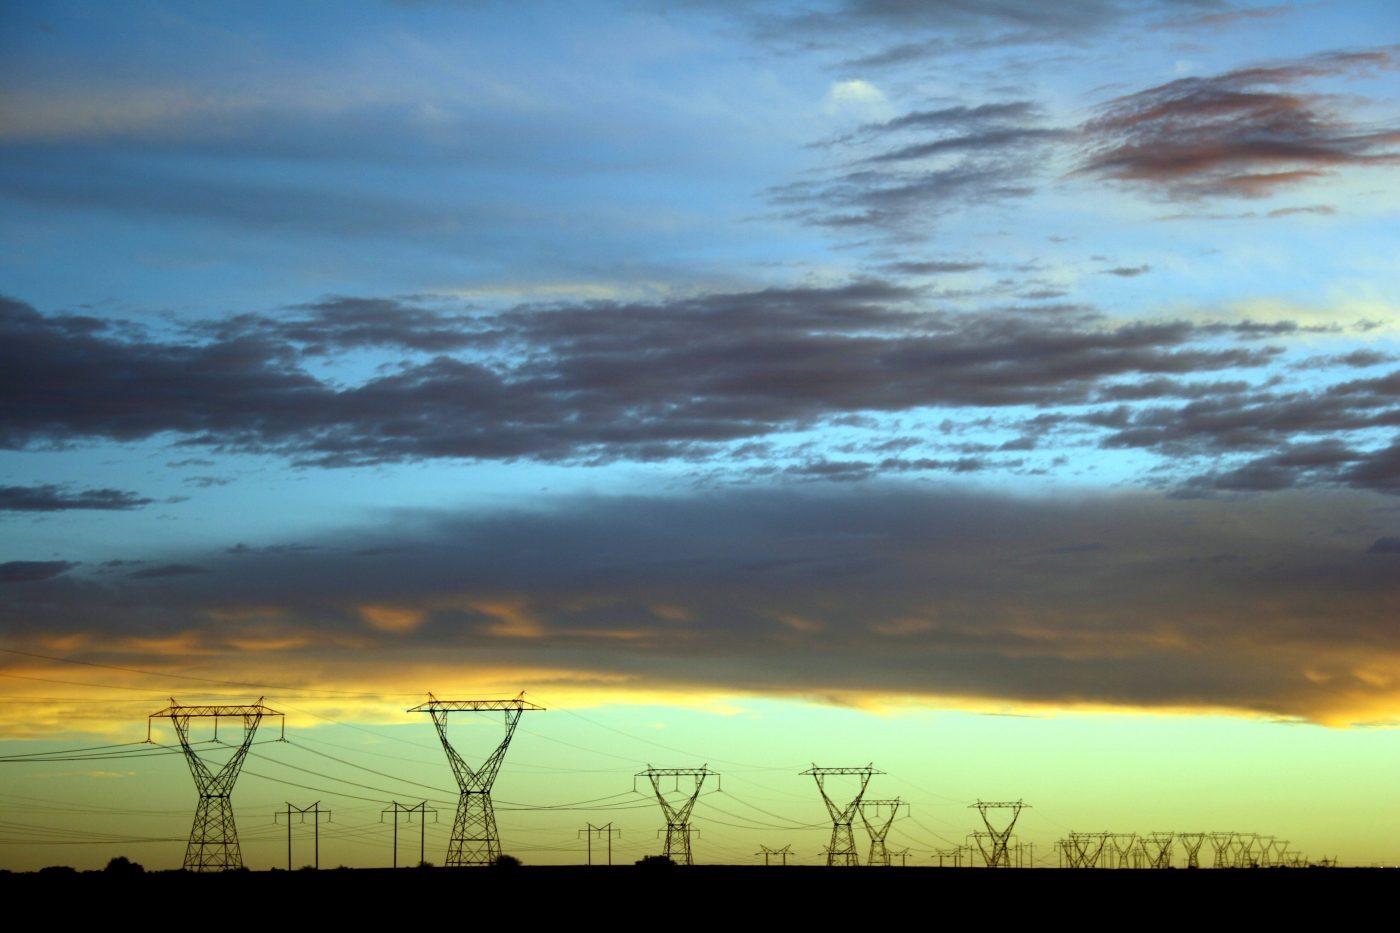 electric-sun-1442715 by Matthew Bowden